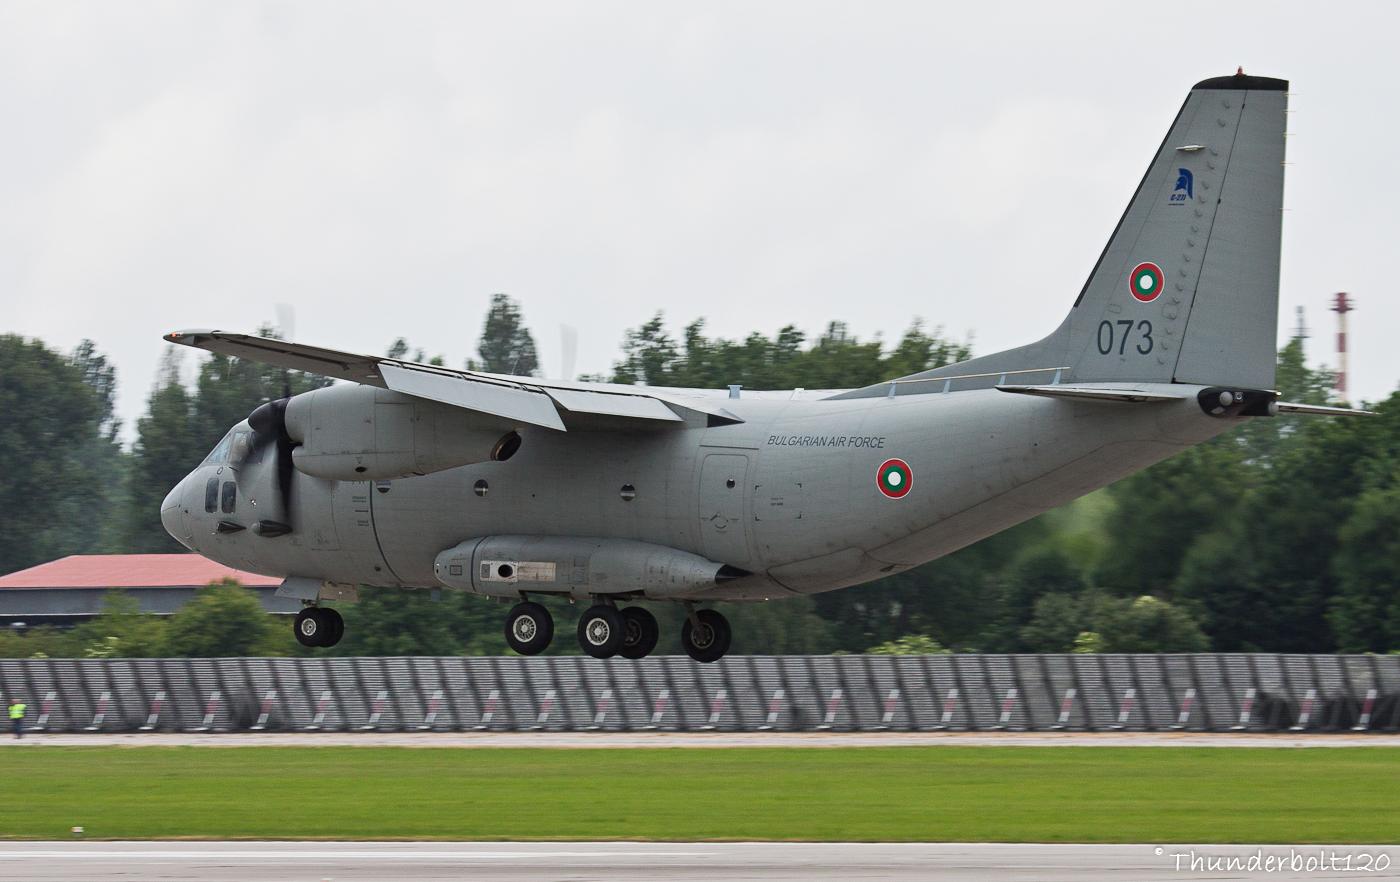 Alenia Aermacchi C-27J Spartan 073